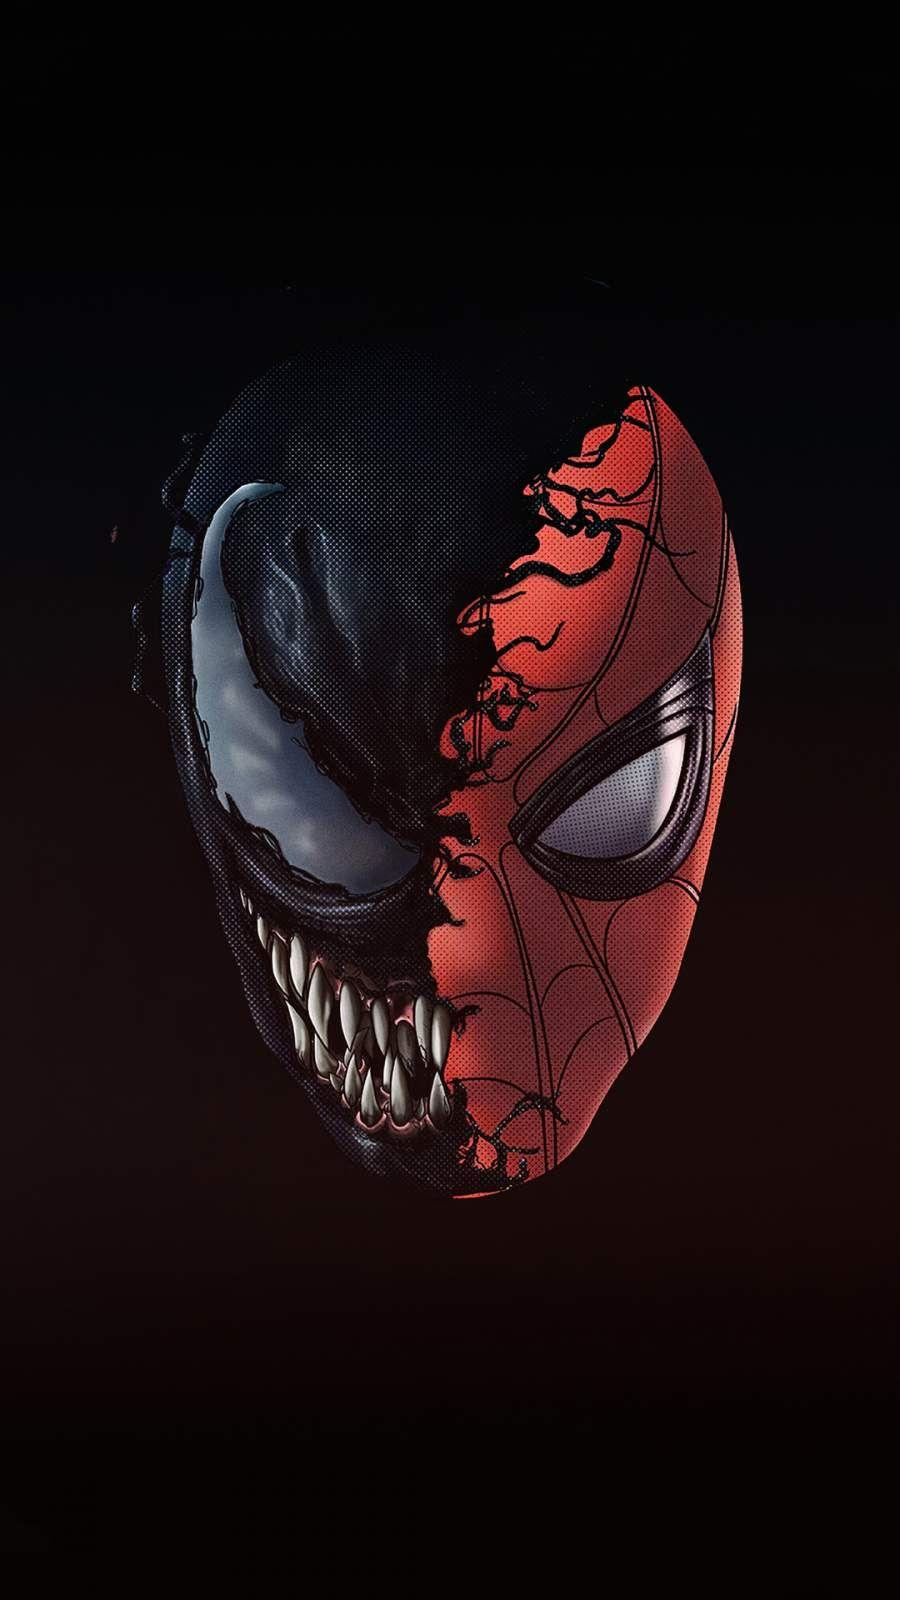 Spiderman X Venom 4k Iphone Wallpaper Marvel Spiderman Art Superhero Wallpaper Marvel Comics Wallpaper